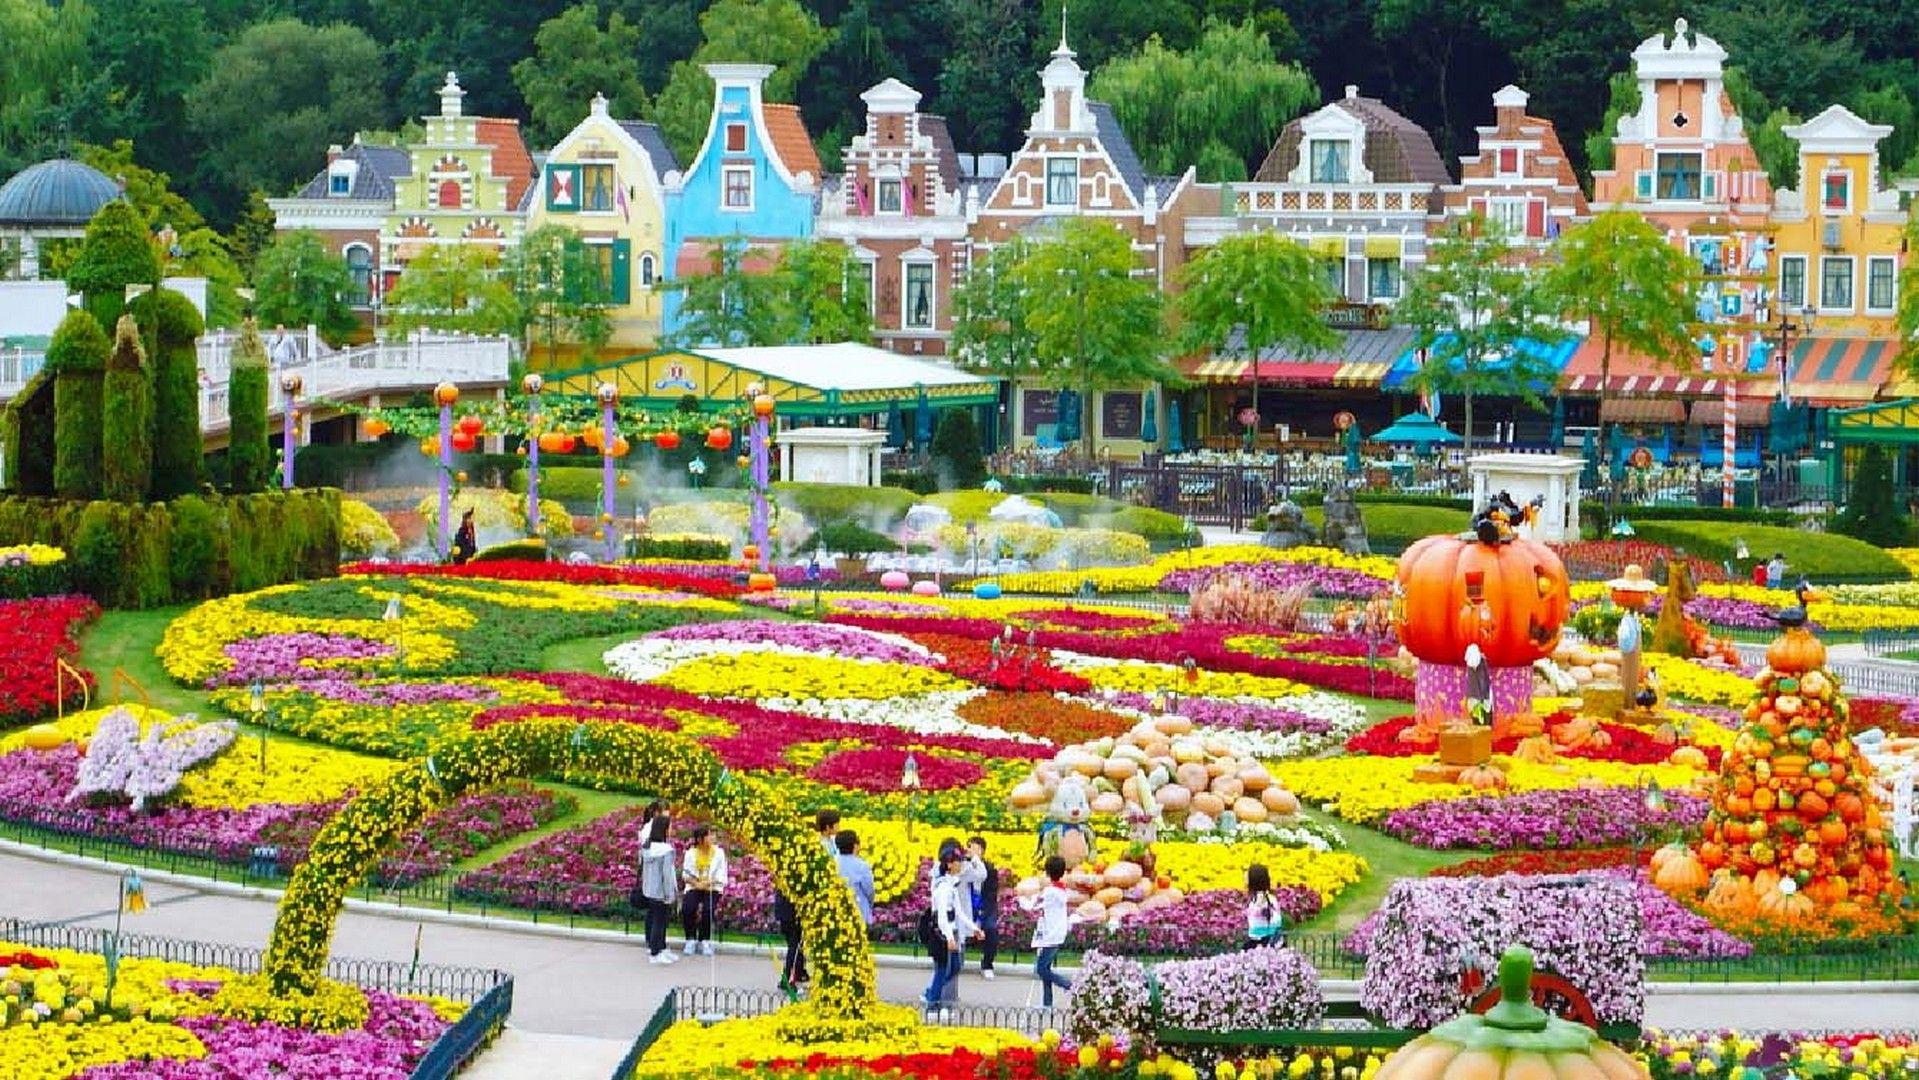 HD Everland wallpaper | Everland wallpapers hd | South korea travel, Seoul korea и South Korea